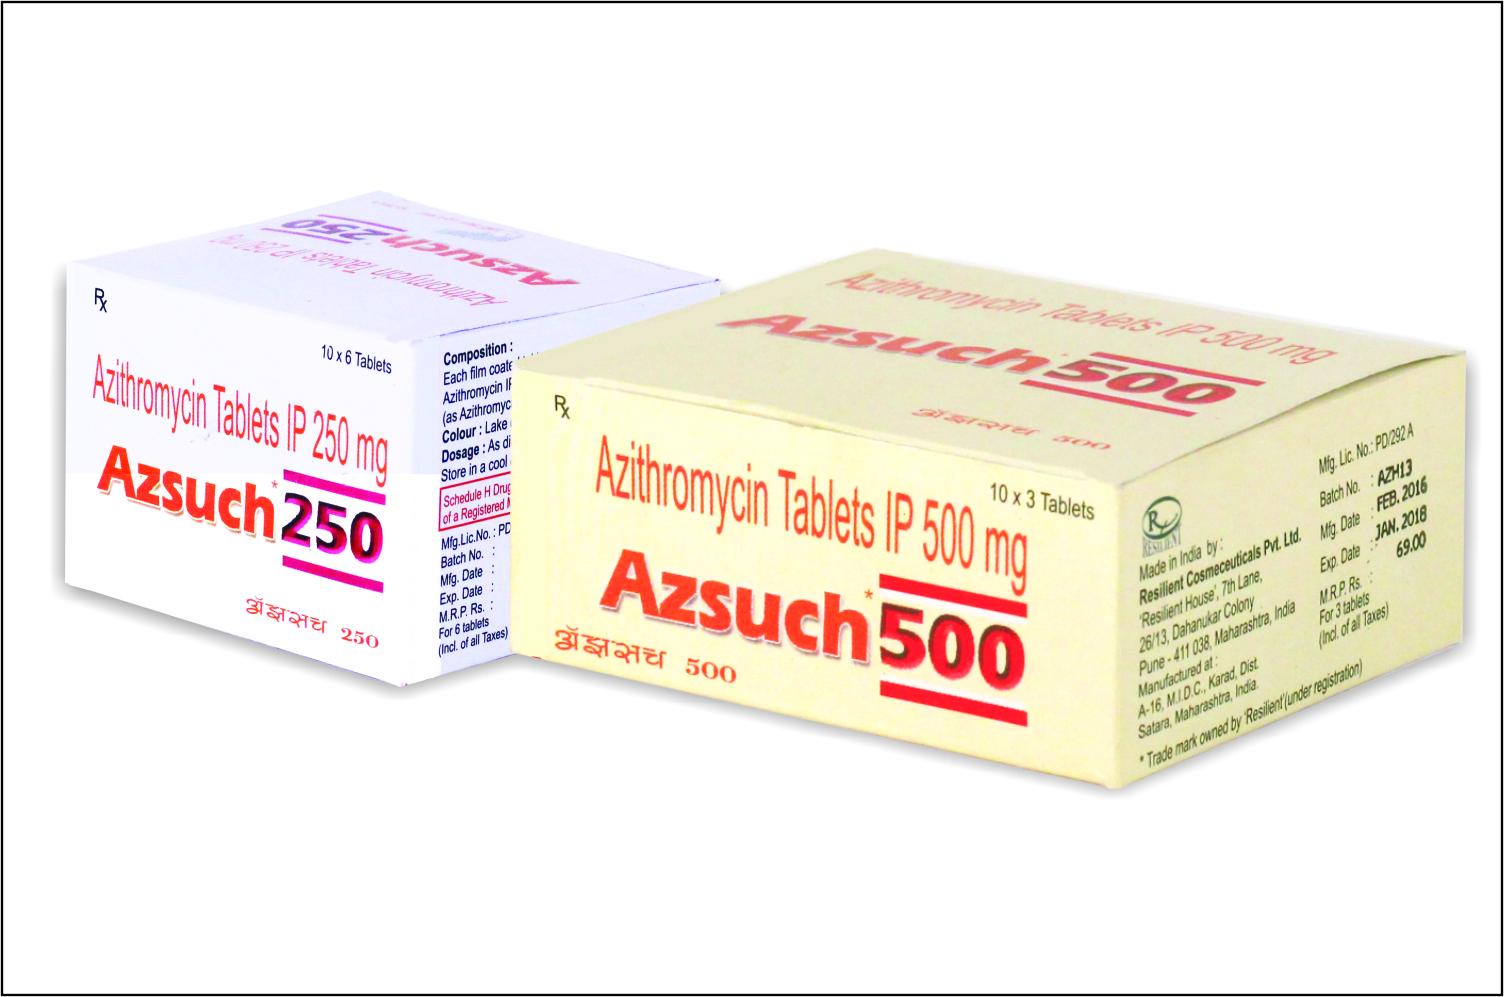 Azsuch 250-500